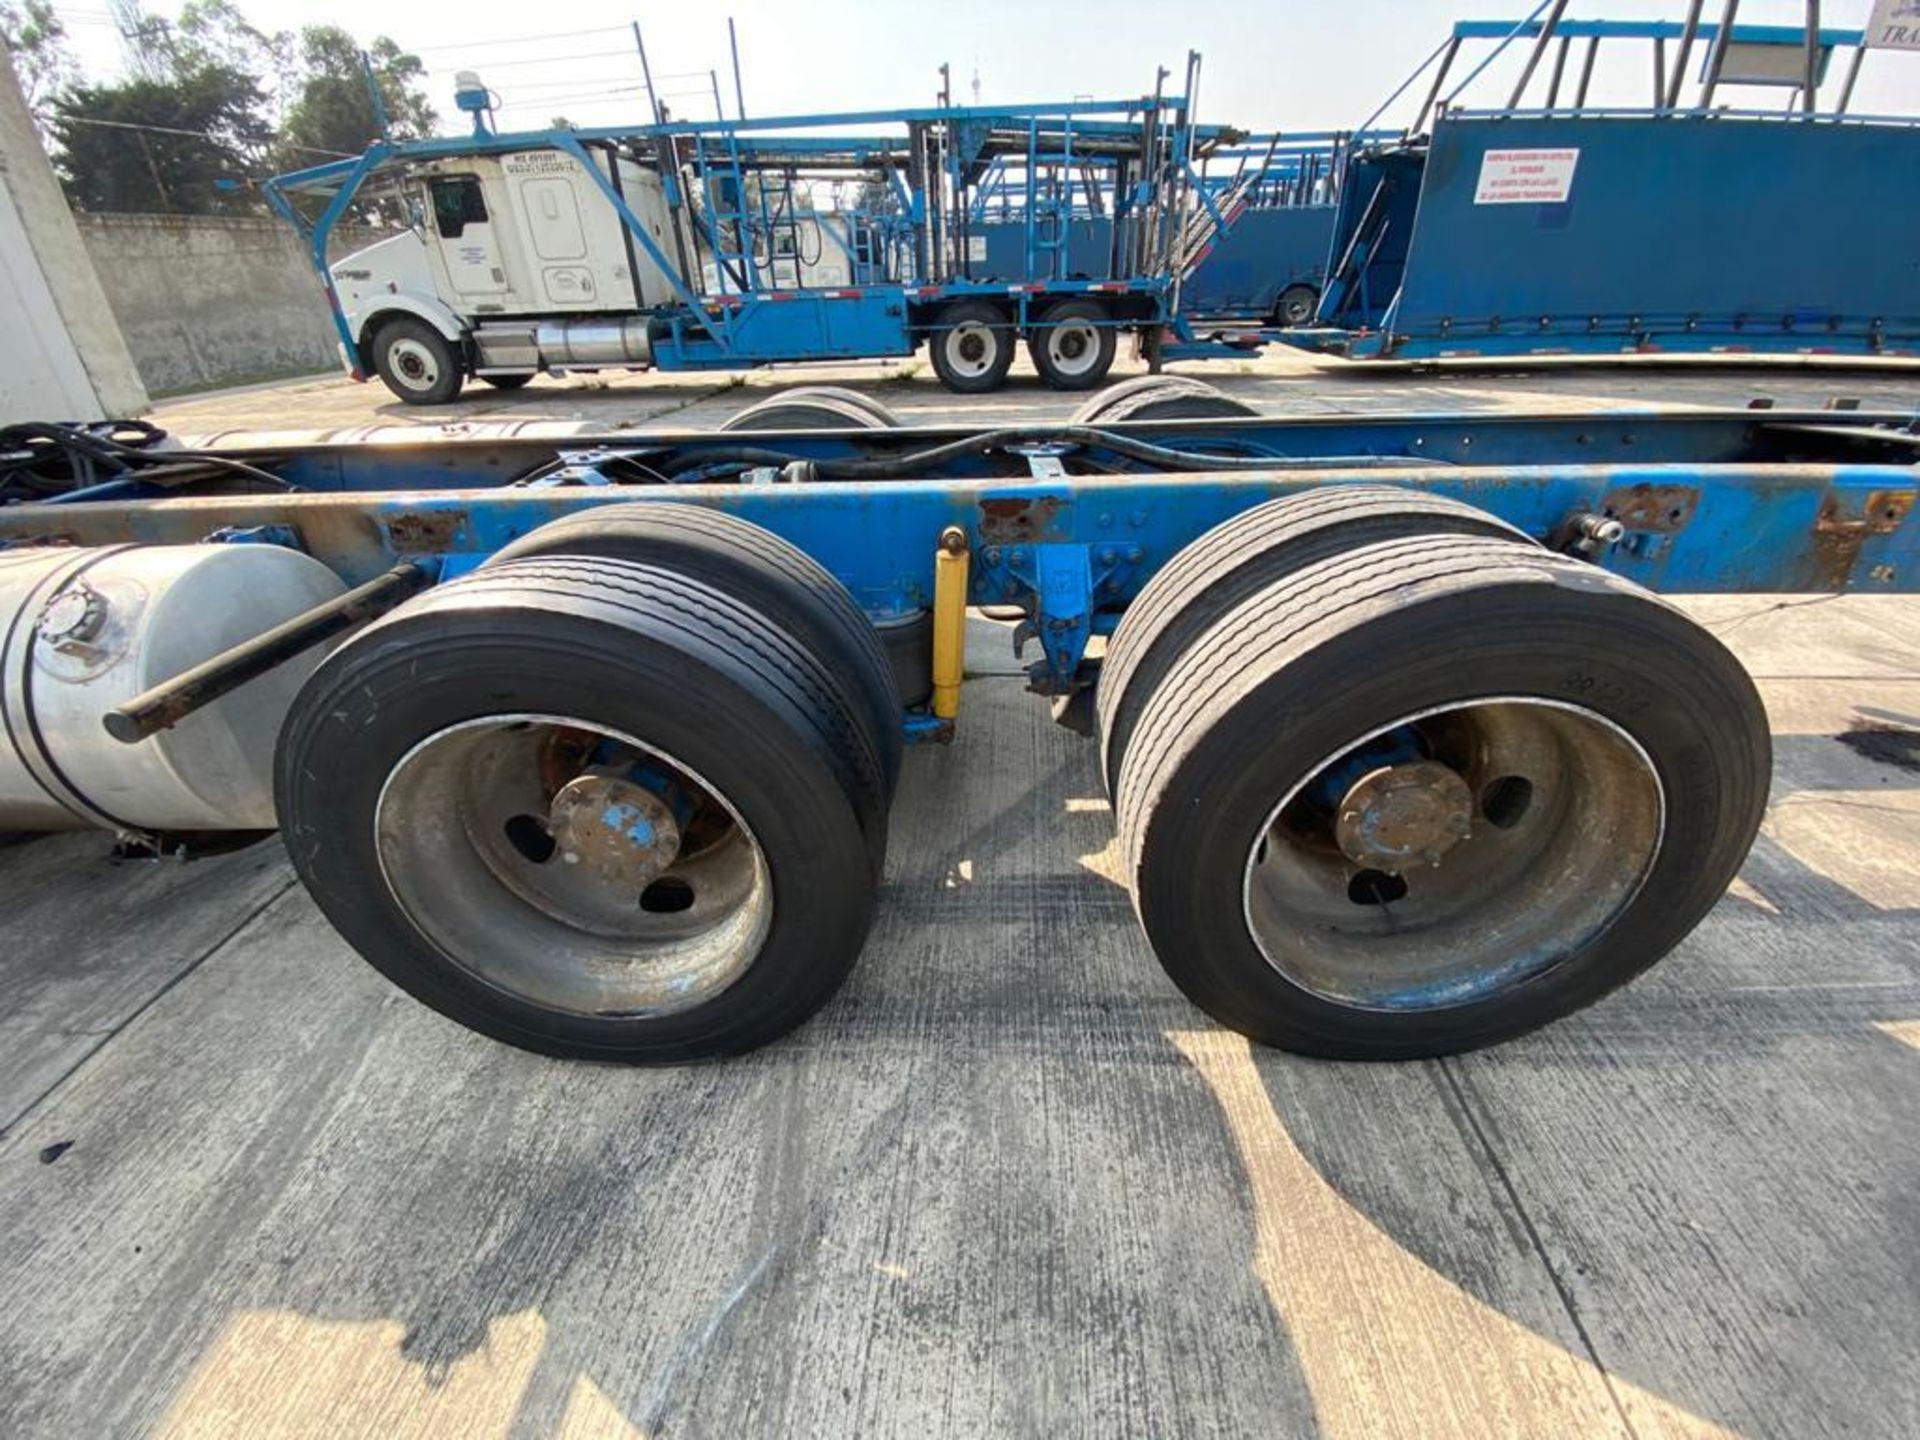 1998 Kenworth Sleeper truck tractor, standard transmission of 18 speeds - Image 16 of 75